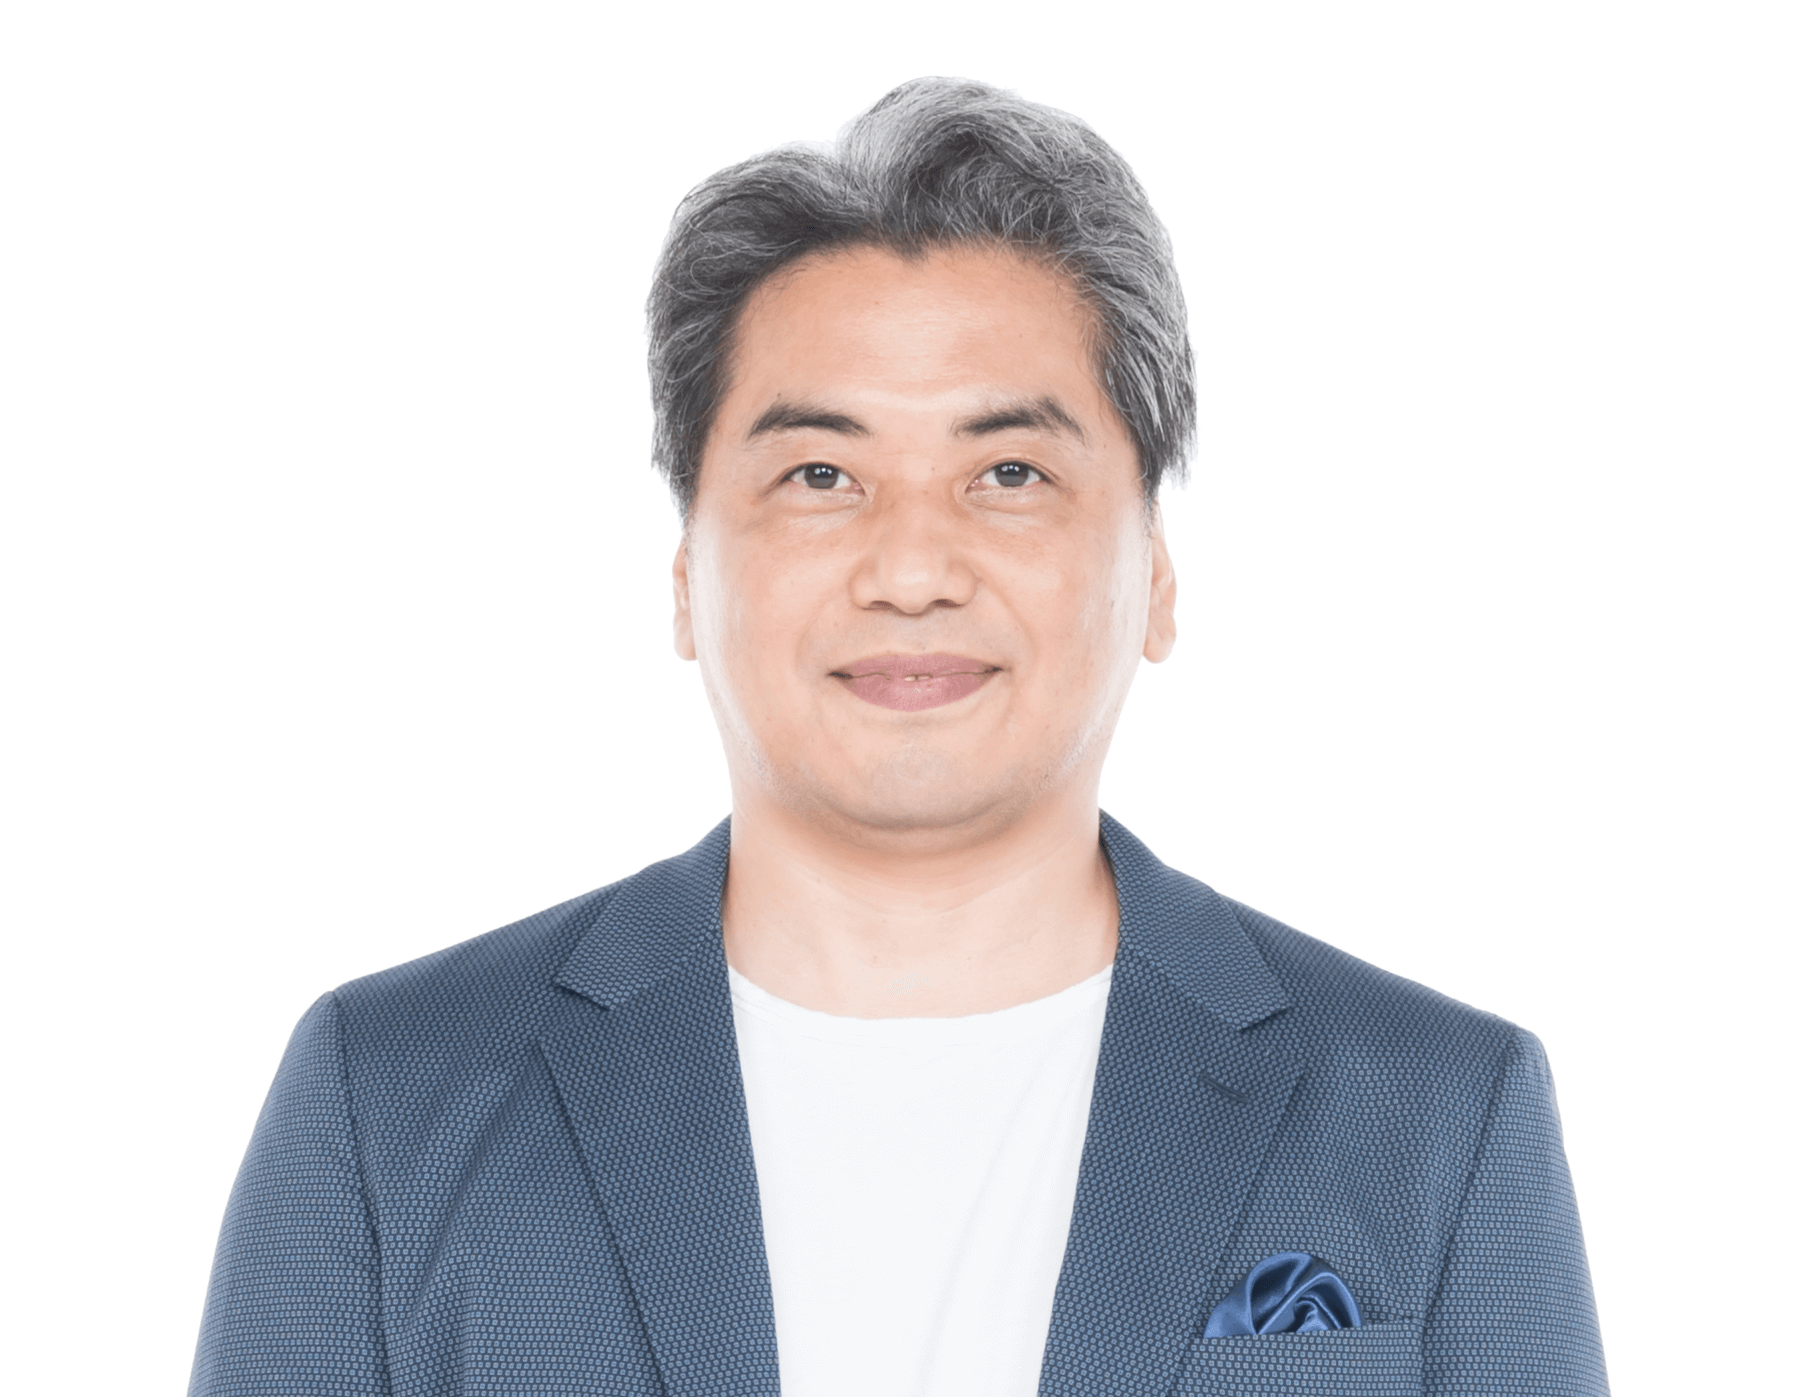 佐藤秋彦/Akihiko Sato